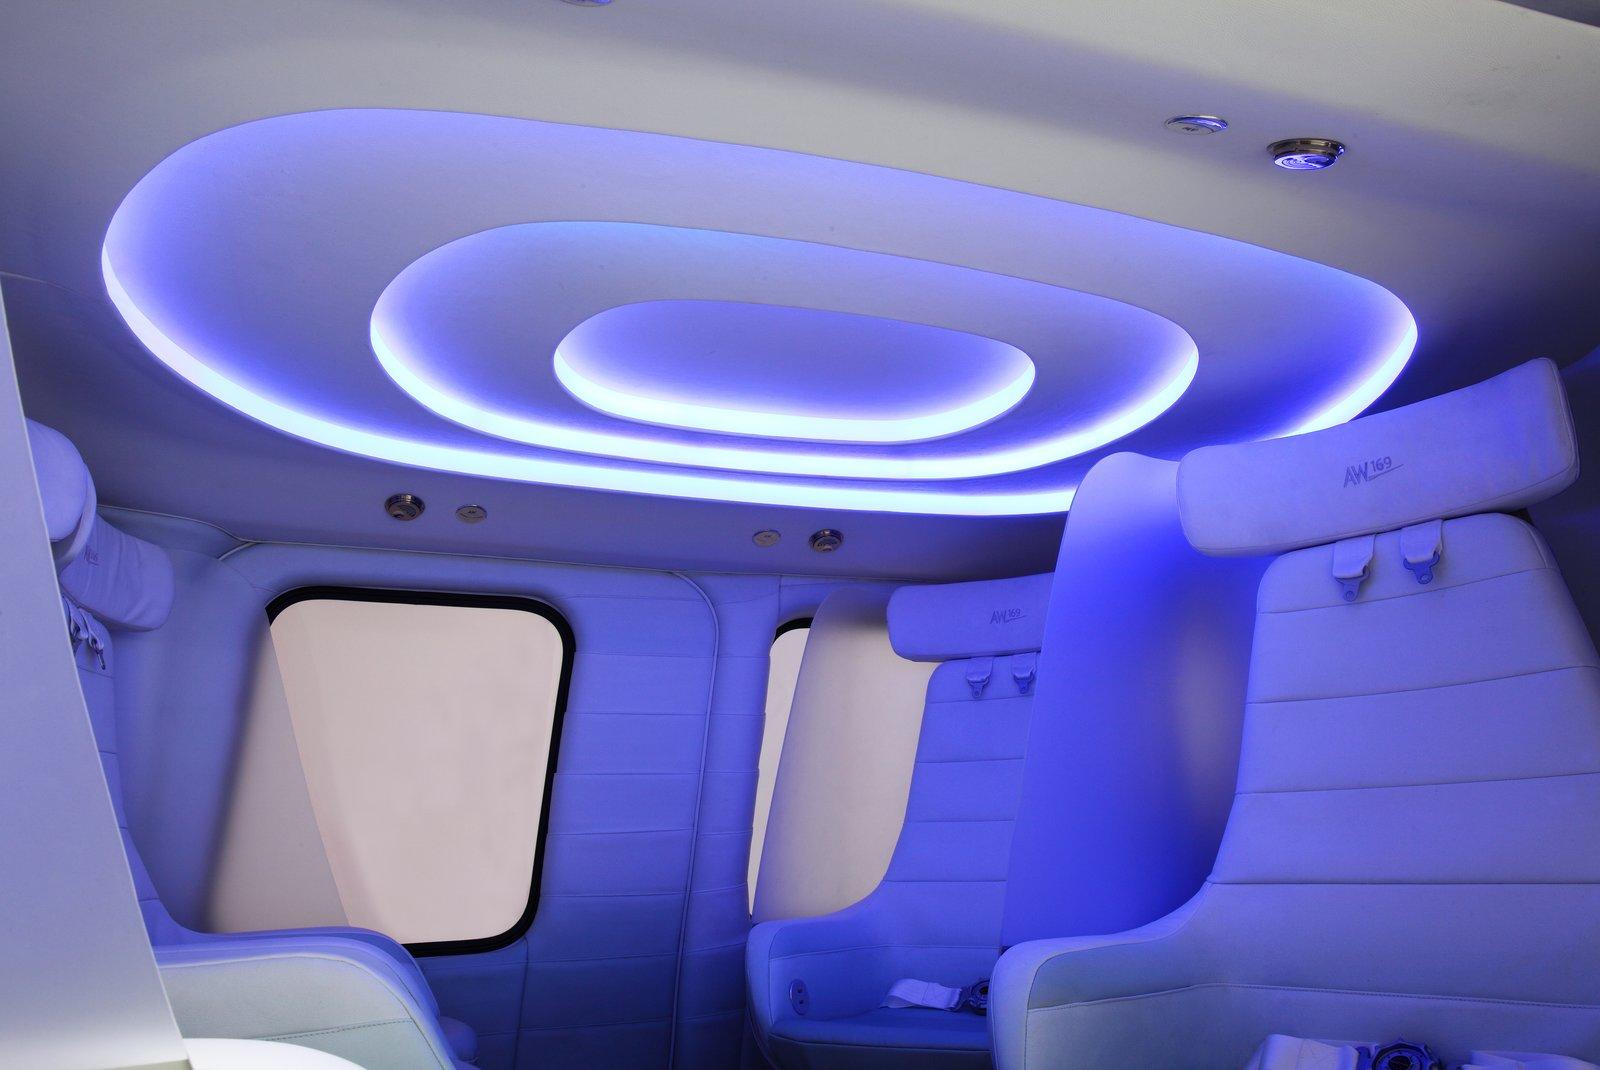 "Three rings embedded with LED lights illuminate the cabin; users can choose which color light they prefer.  Search ""김포출장마사지-출장안마-출장-출장서비스 김포콜걸 출장샵 주소ㅋr톡BC388 주소[sannhu222,vip] 김포 출장여대생 만남 출장만남 업소 타이마사지 출장샵추천 업소  김포출장샵 출장서비스 출장업소"" from The Ultimate Ride: VIP Helicopter with Plush Interior"